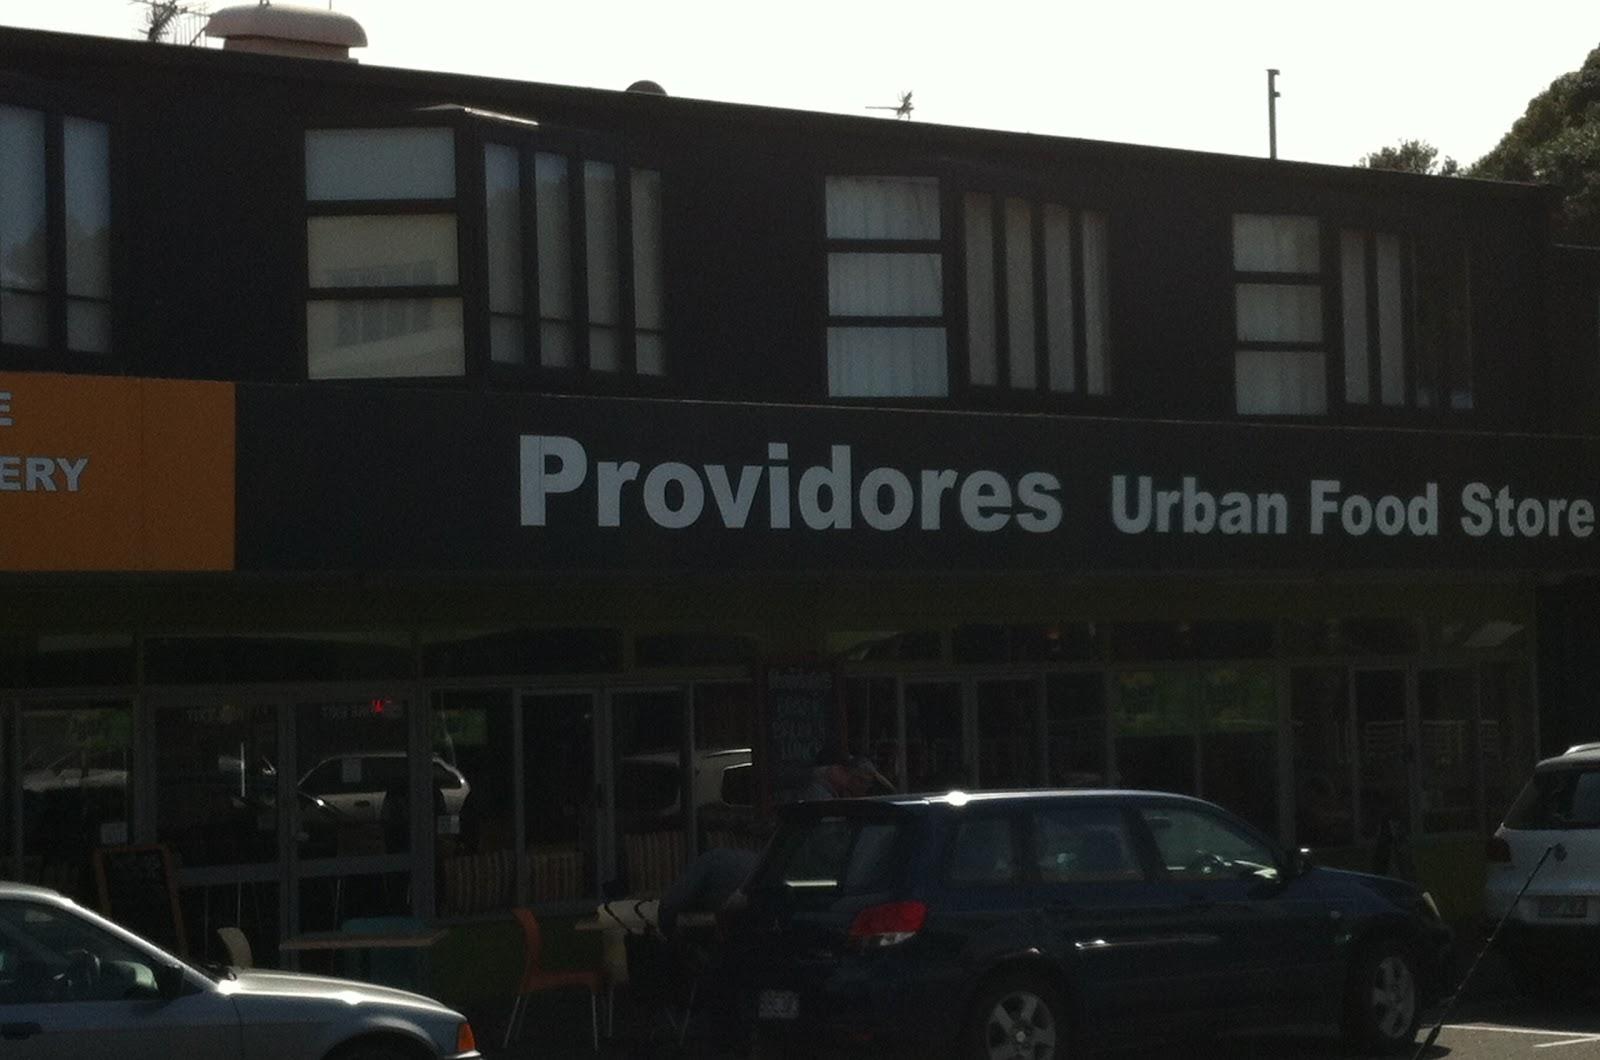 Providores Urban Food Store